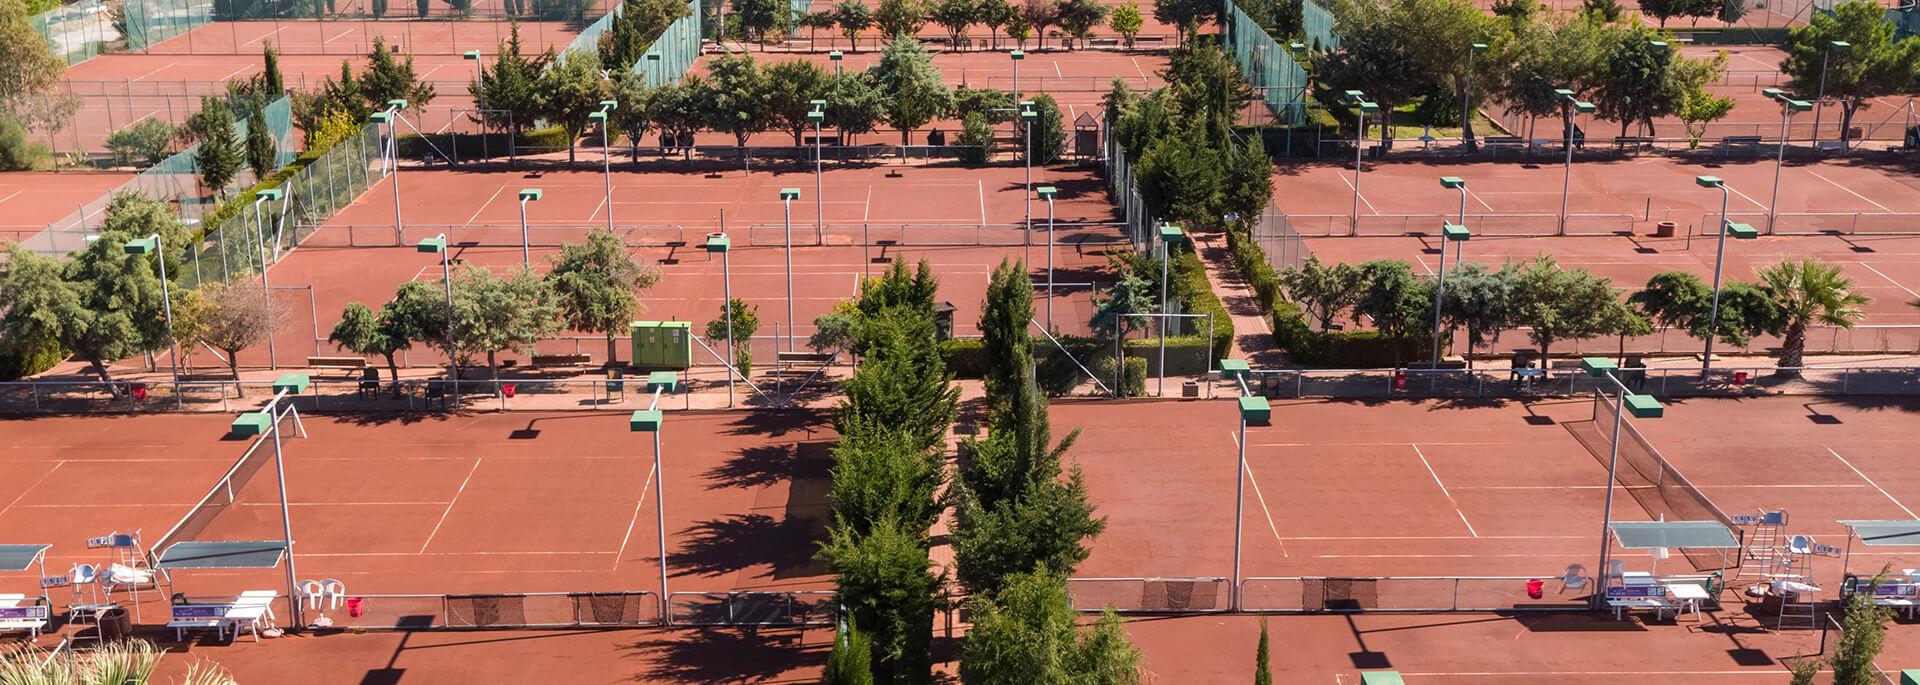 Tennis - Ali Bey Park Manavgat - Side, Antalya, Türkei